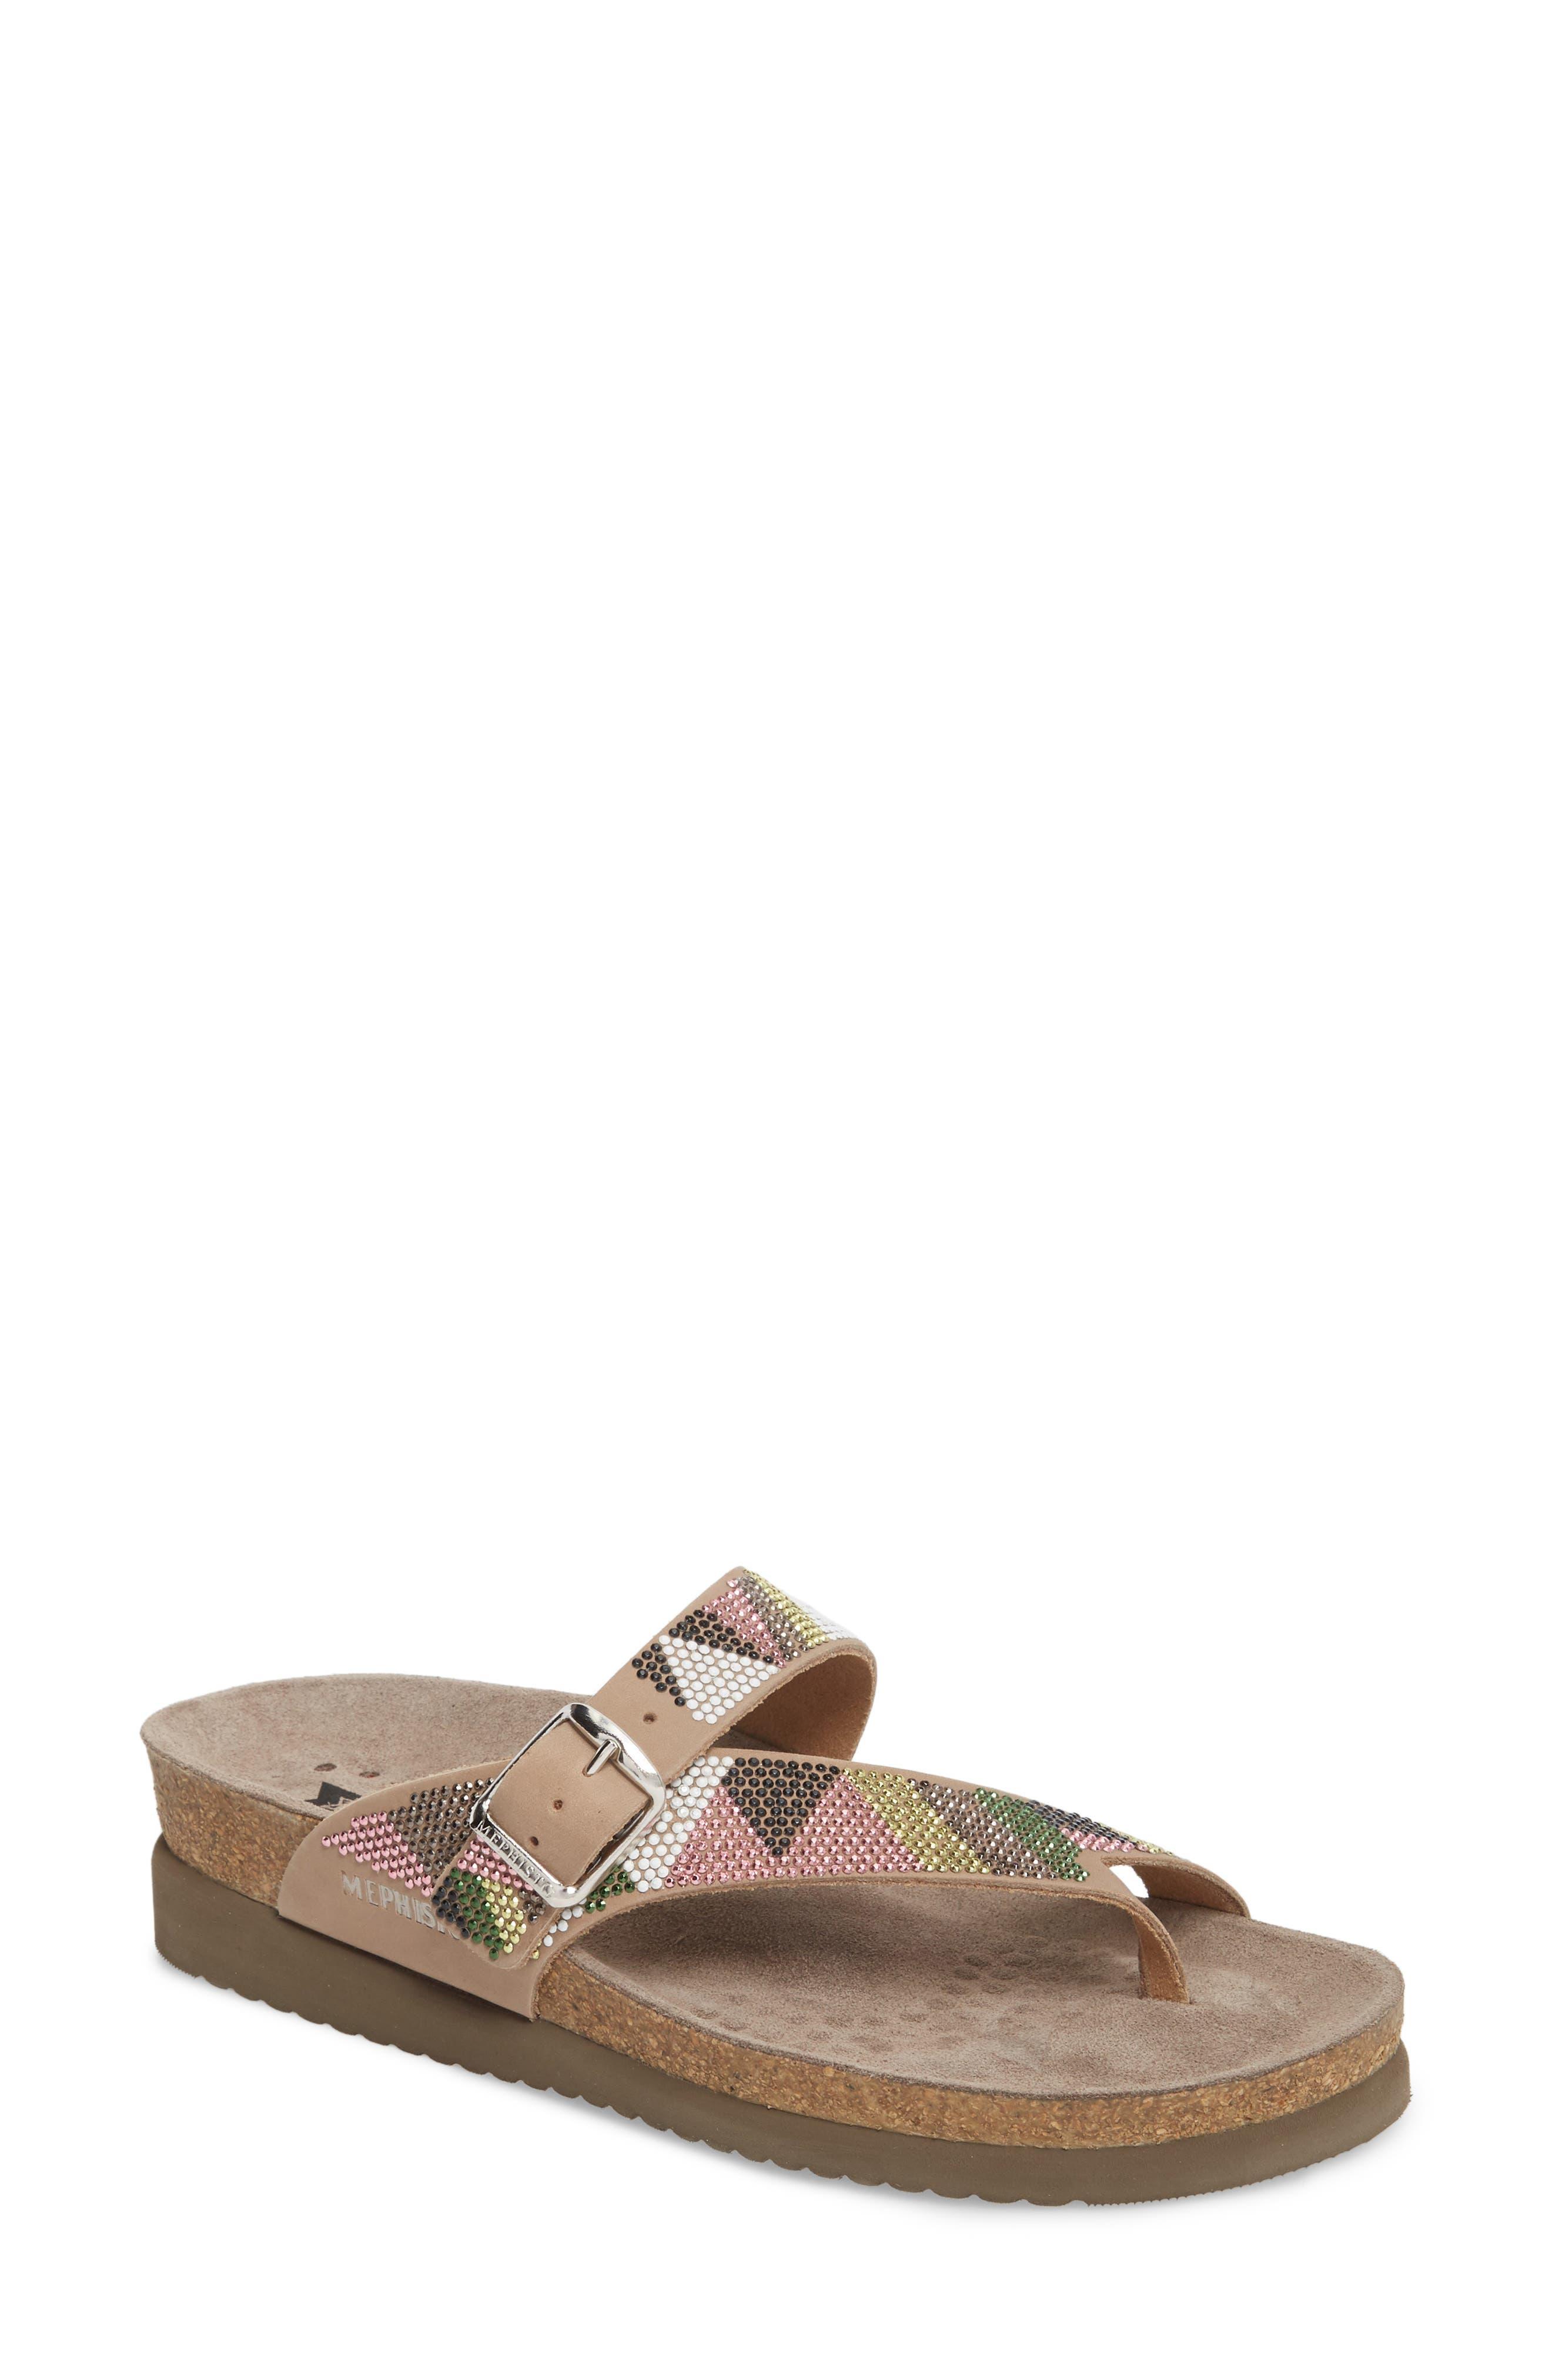 Helen Slide Sandal,                             Main thumbnail 1, color,                             Taupe/ Green/ Pink